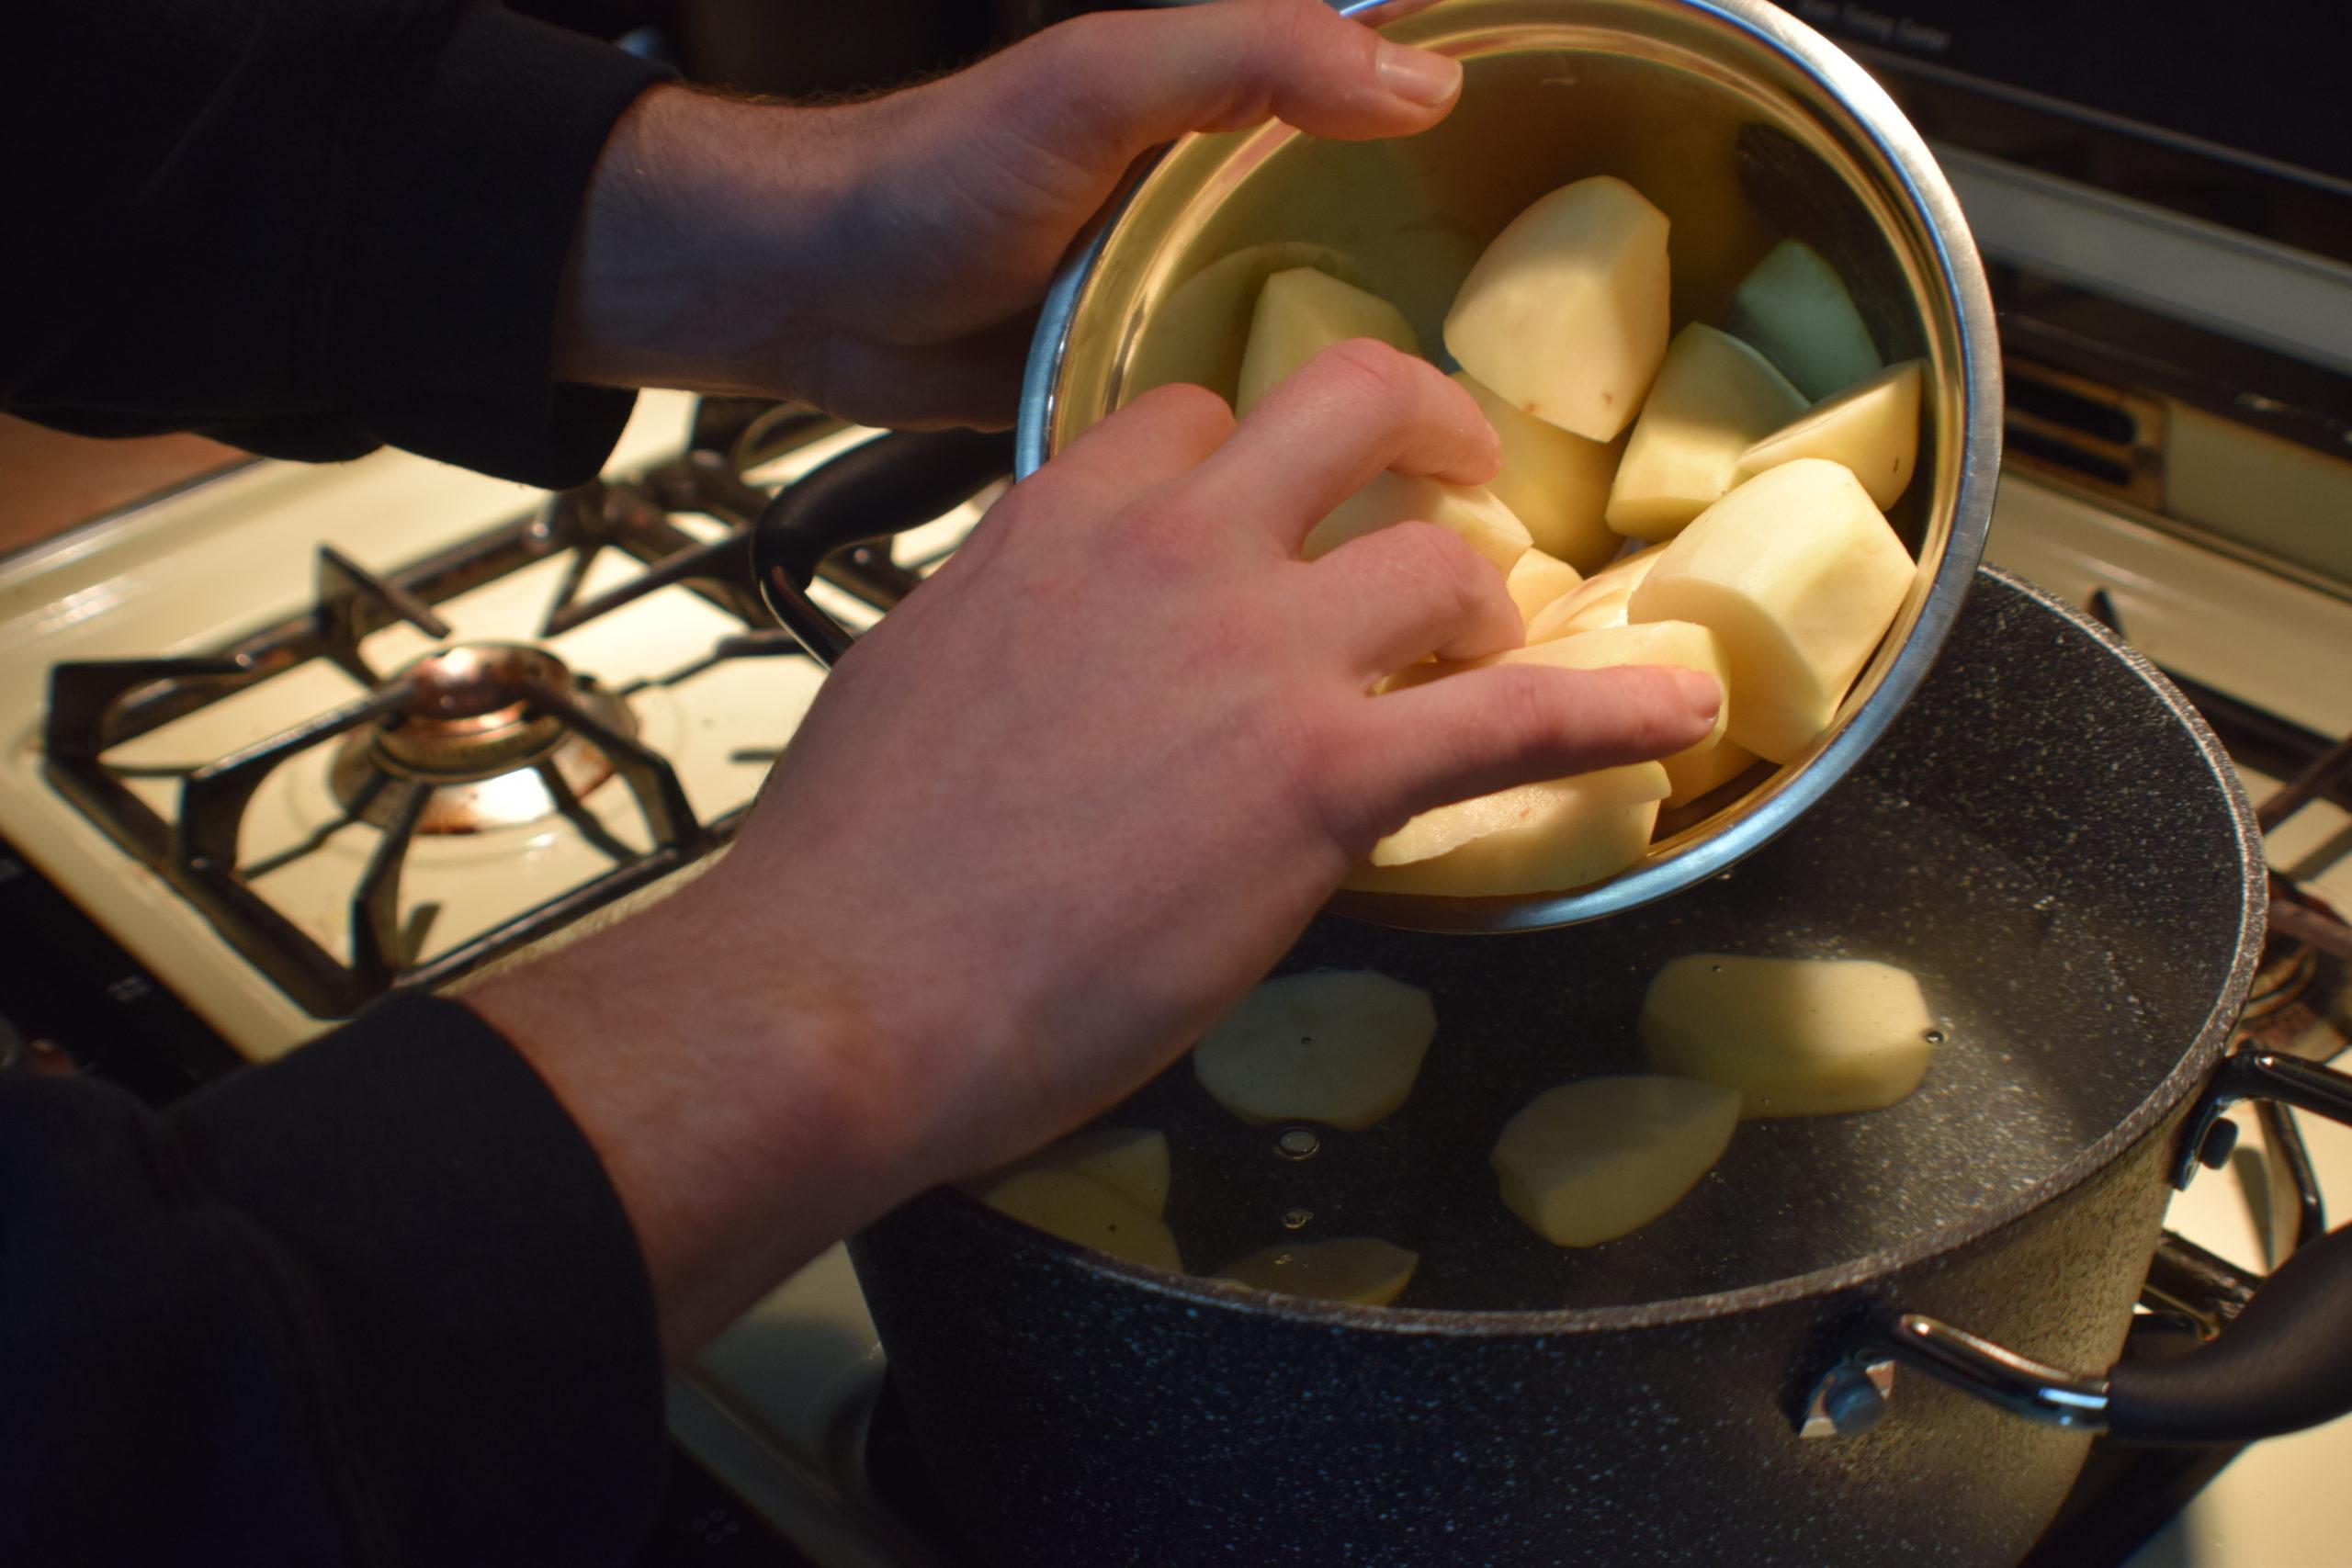 mans hands putting cut potatoes into a pot of water